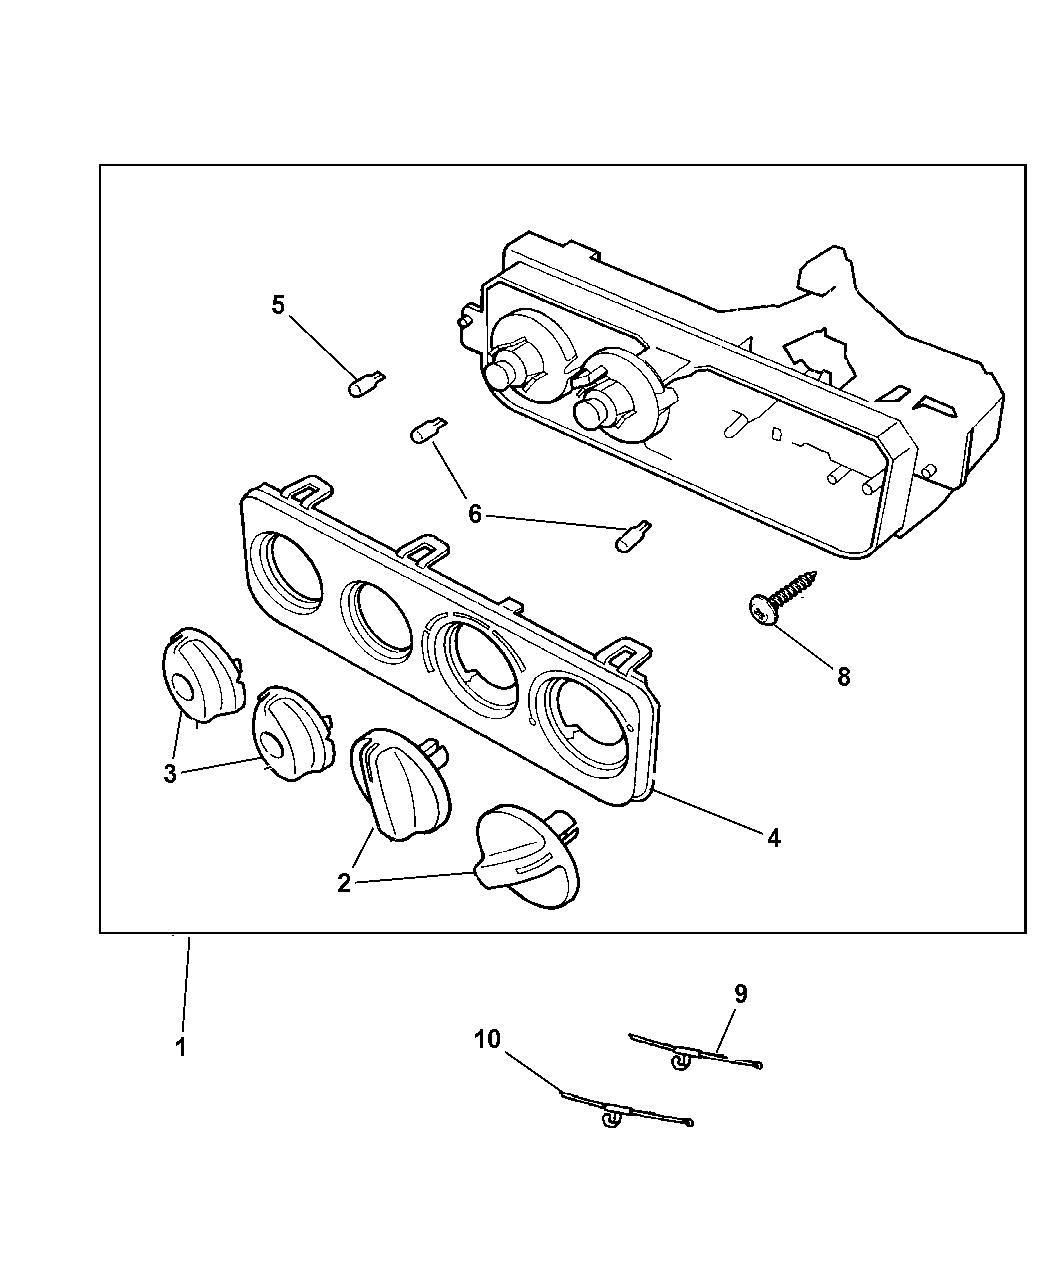 1997 Chrysler Sebring Convertible Controls A  C  U0026 Heater